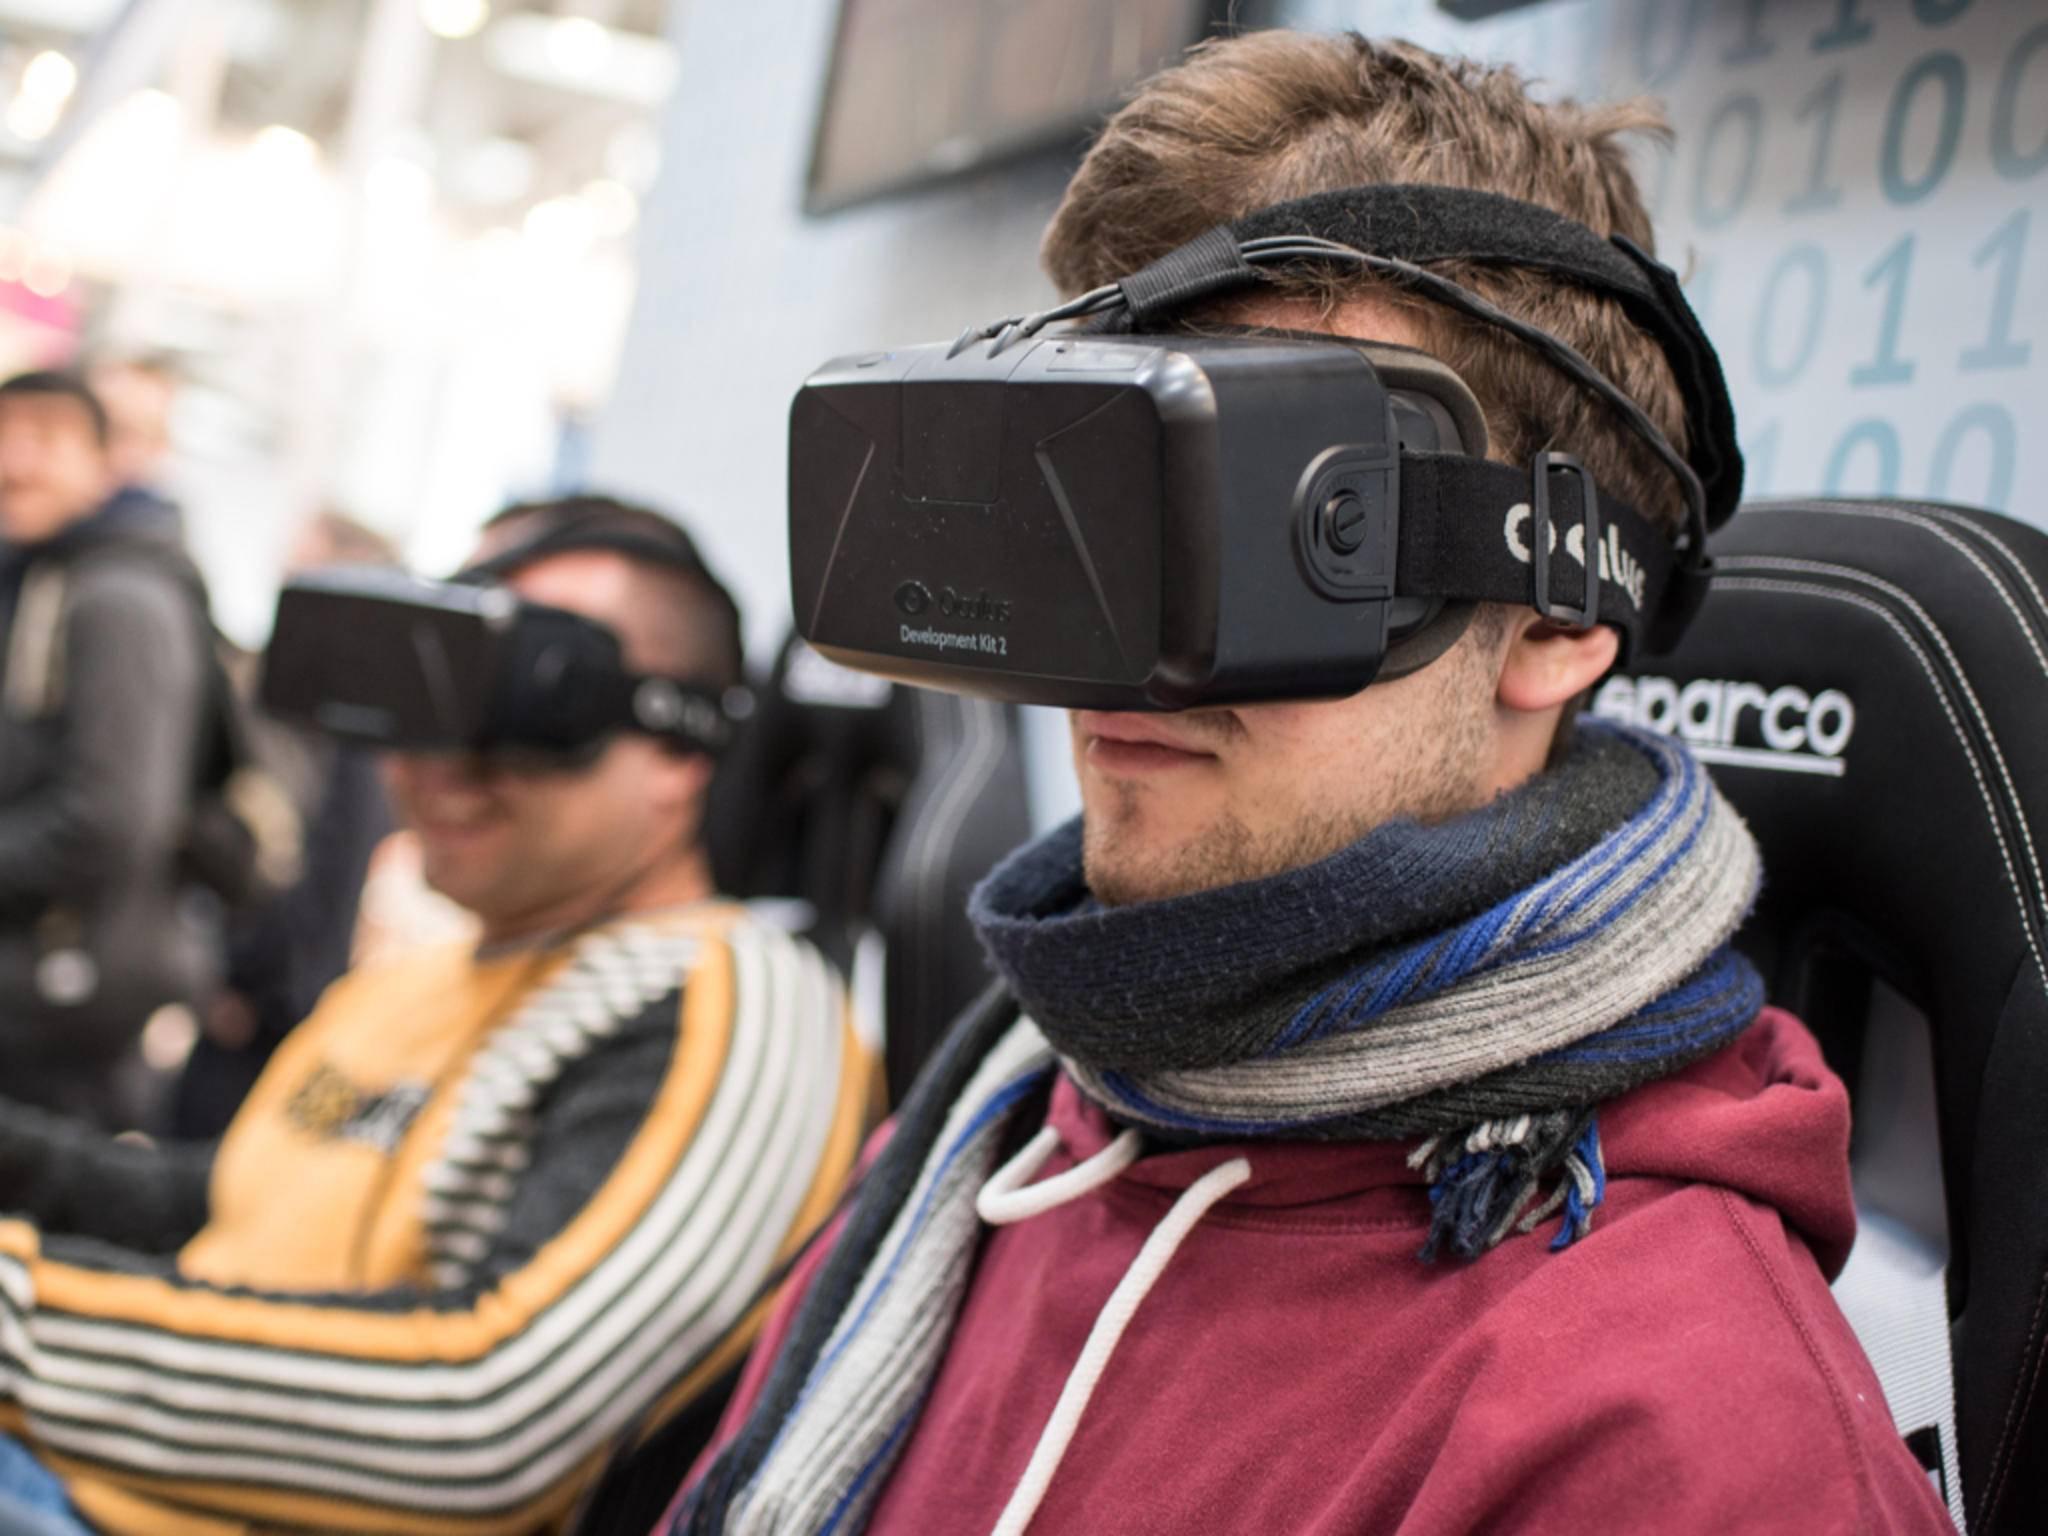 Die VR-Brille Oculus Rift kommt Anfang 2016.